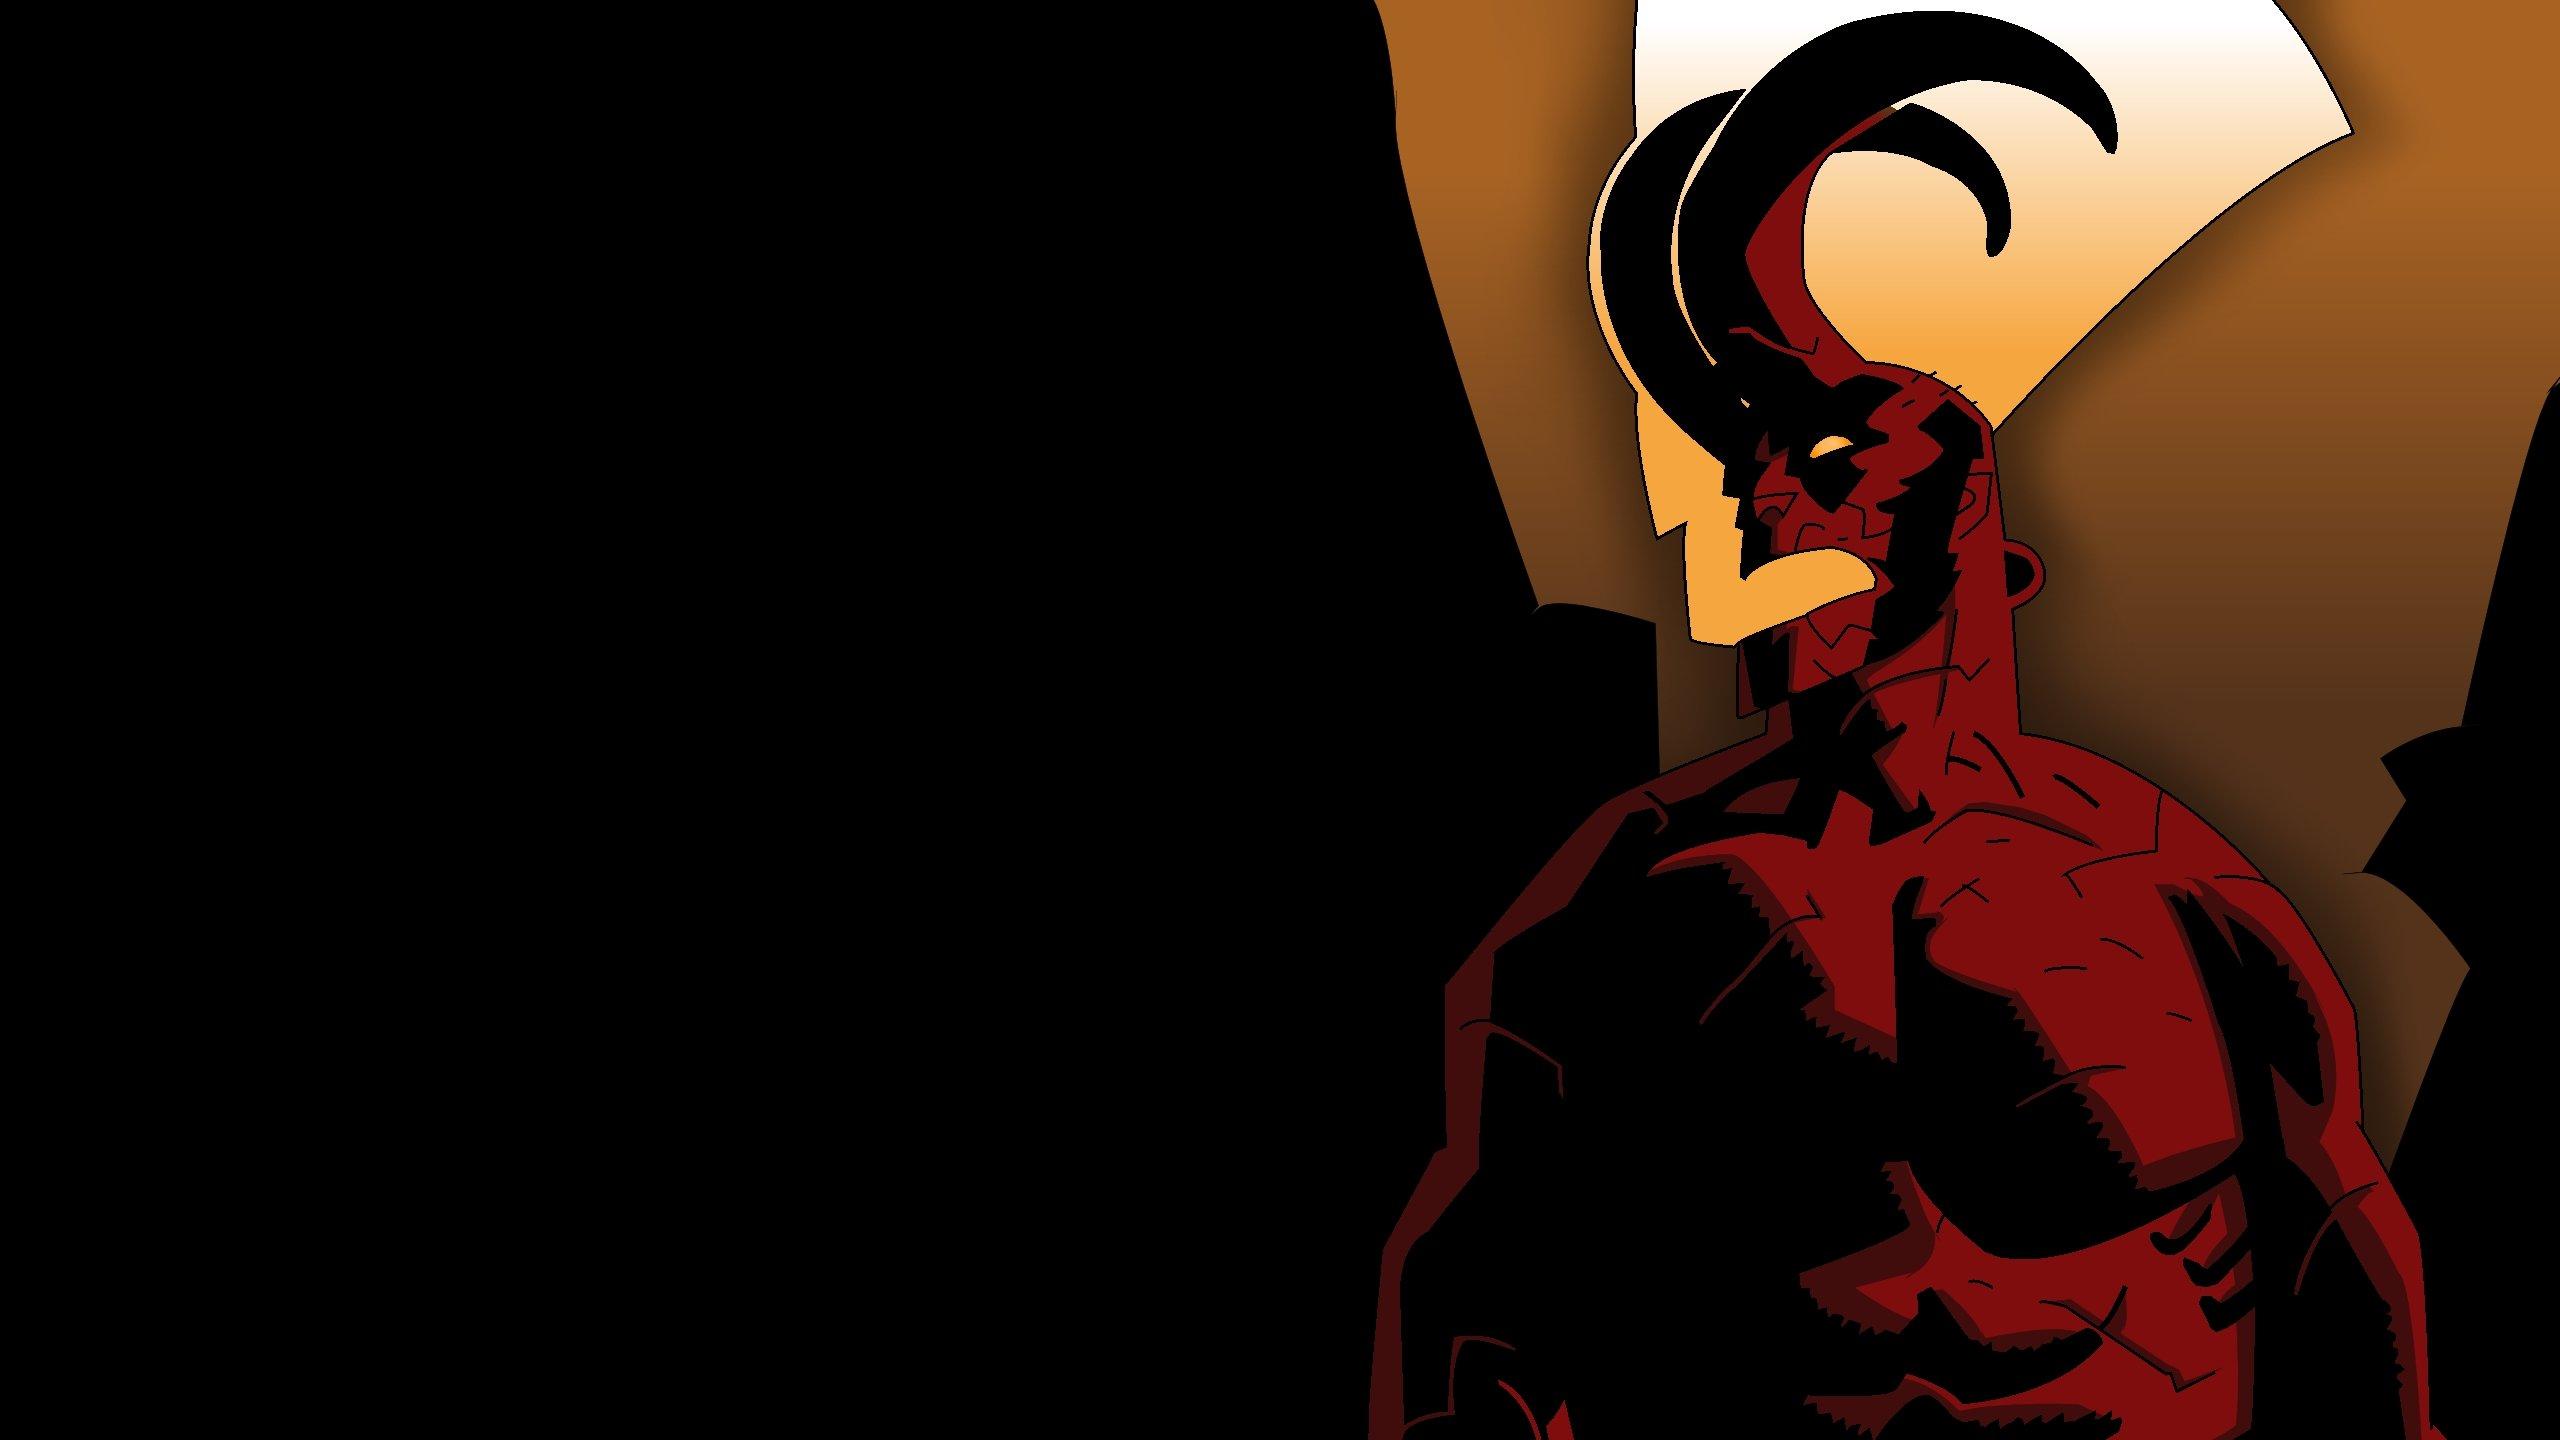 Best Hellboy Background Id 397580 For High Resolution Hd 2560x1440